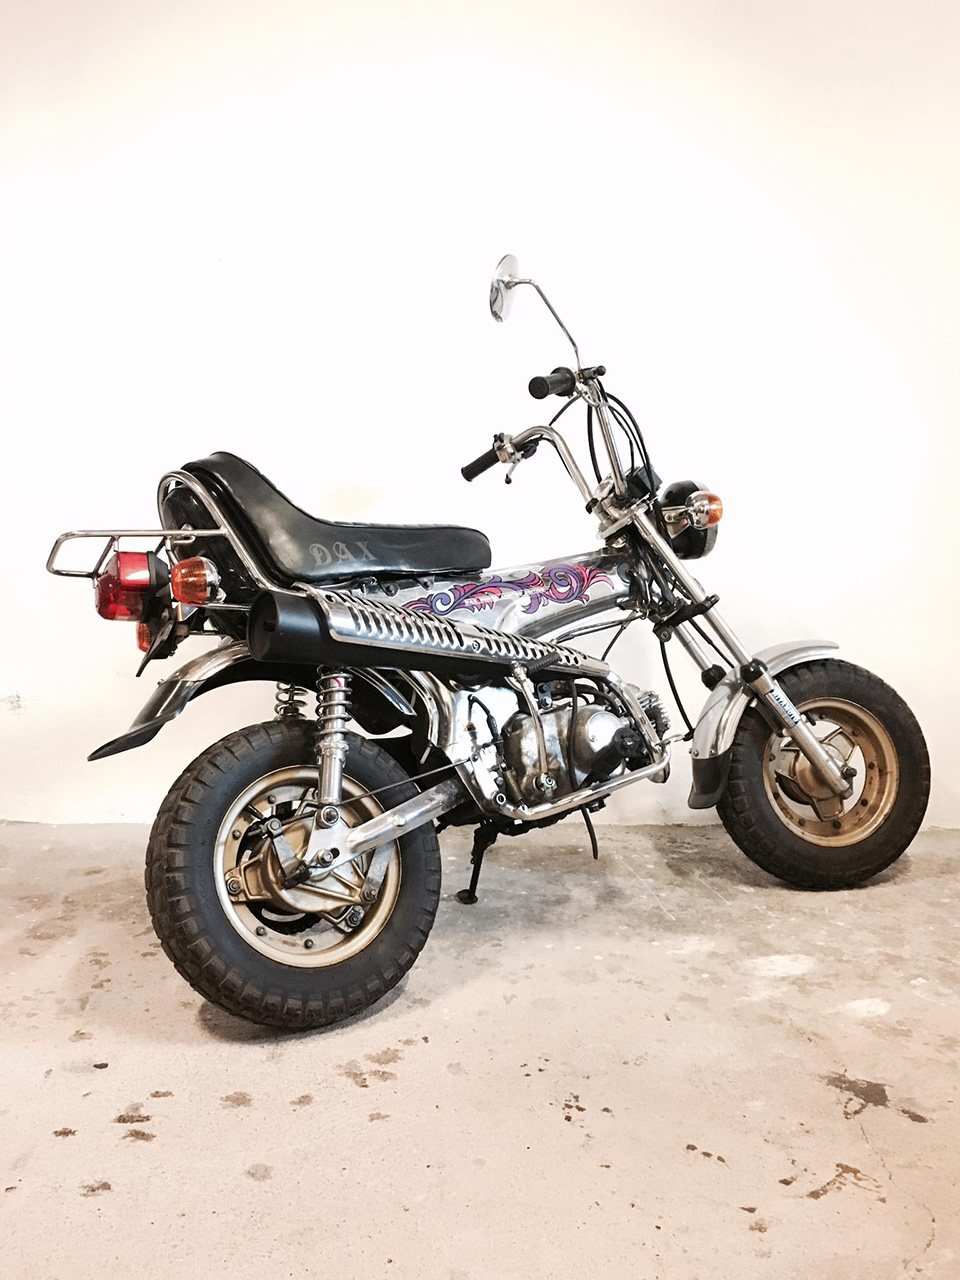 Honda Dax ST50M chez Dauphine-Lamarck - mini4temps.fr